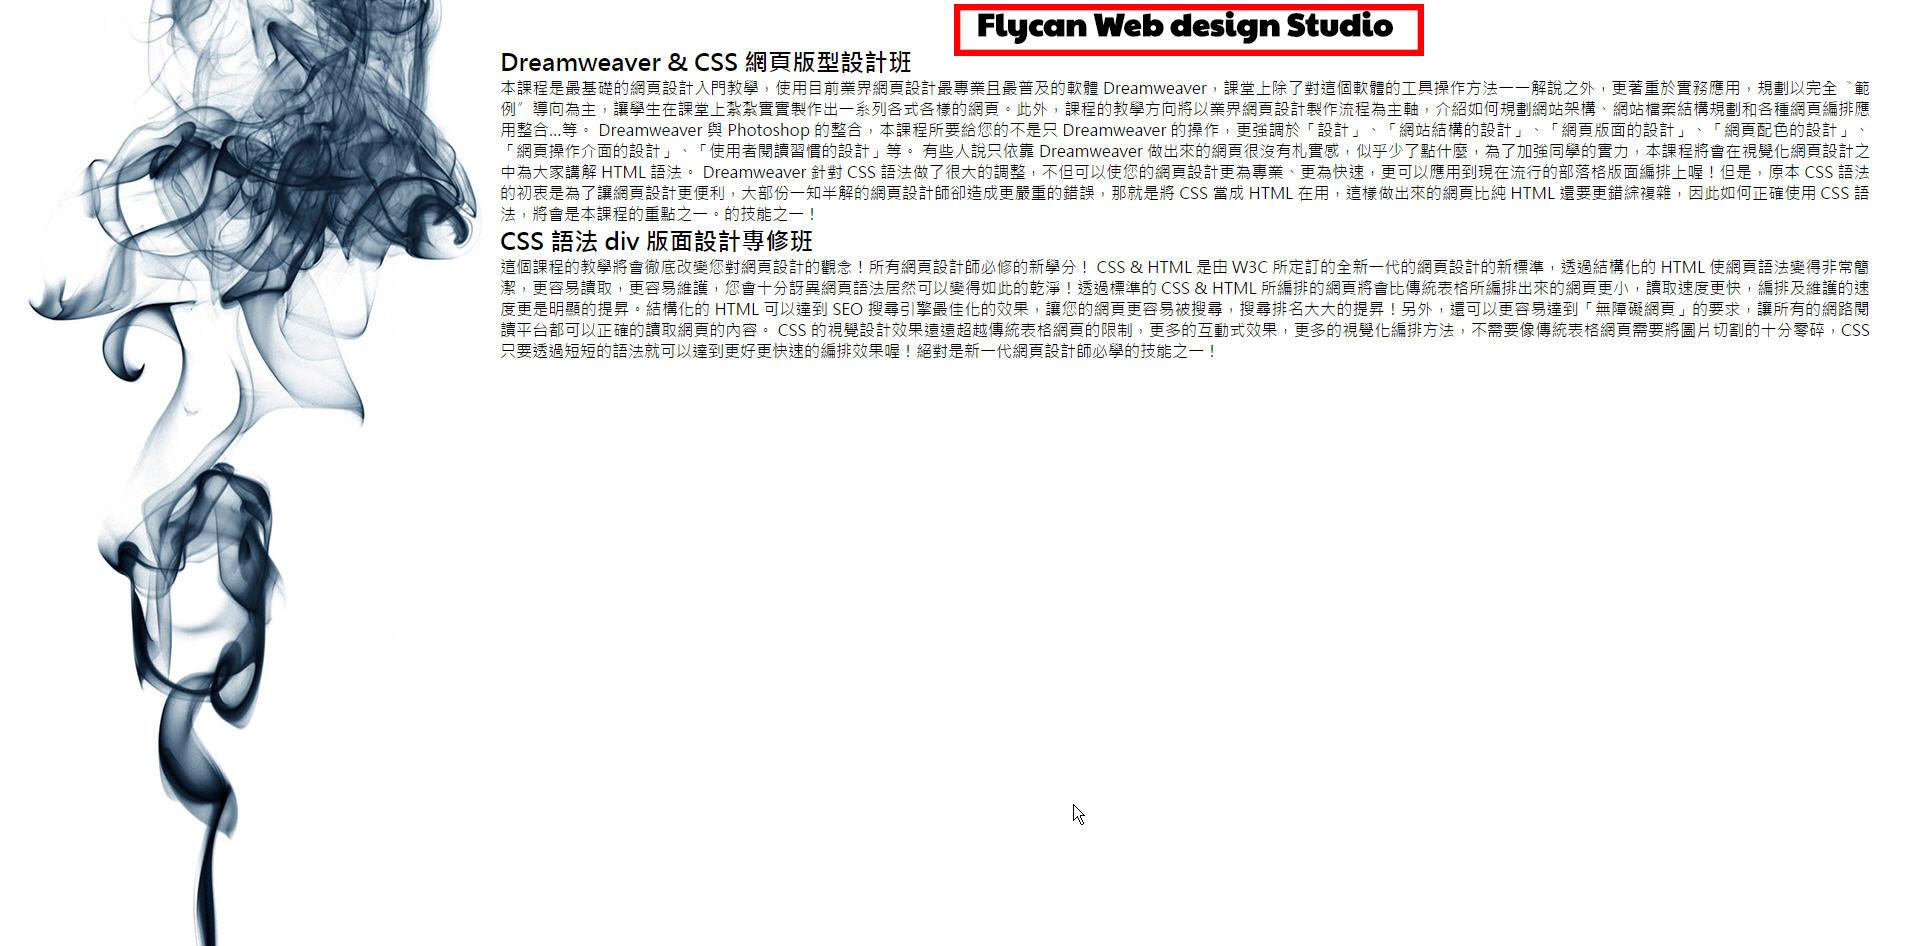 CSS 語法 - 網頁設計 Free Resource 好康報報 Good Design 好站報報  - 【設計資源】 - Google Fonts 免費雲端字庫-實作篇 - 11-1